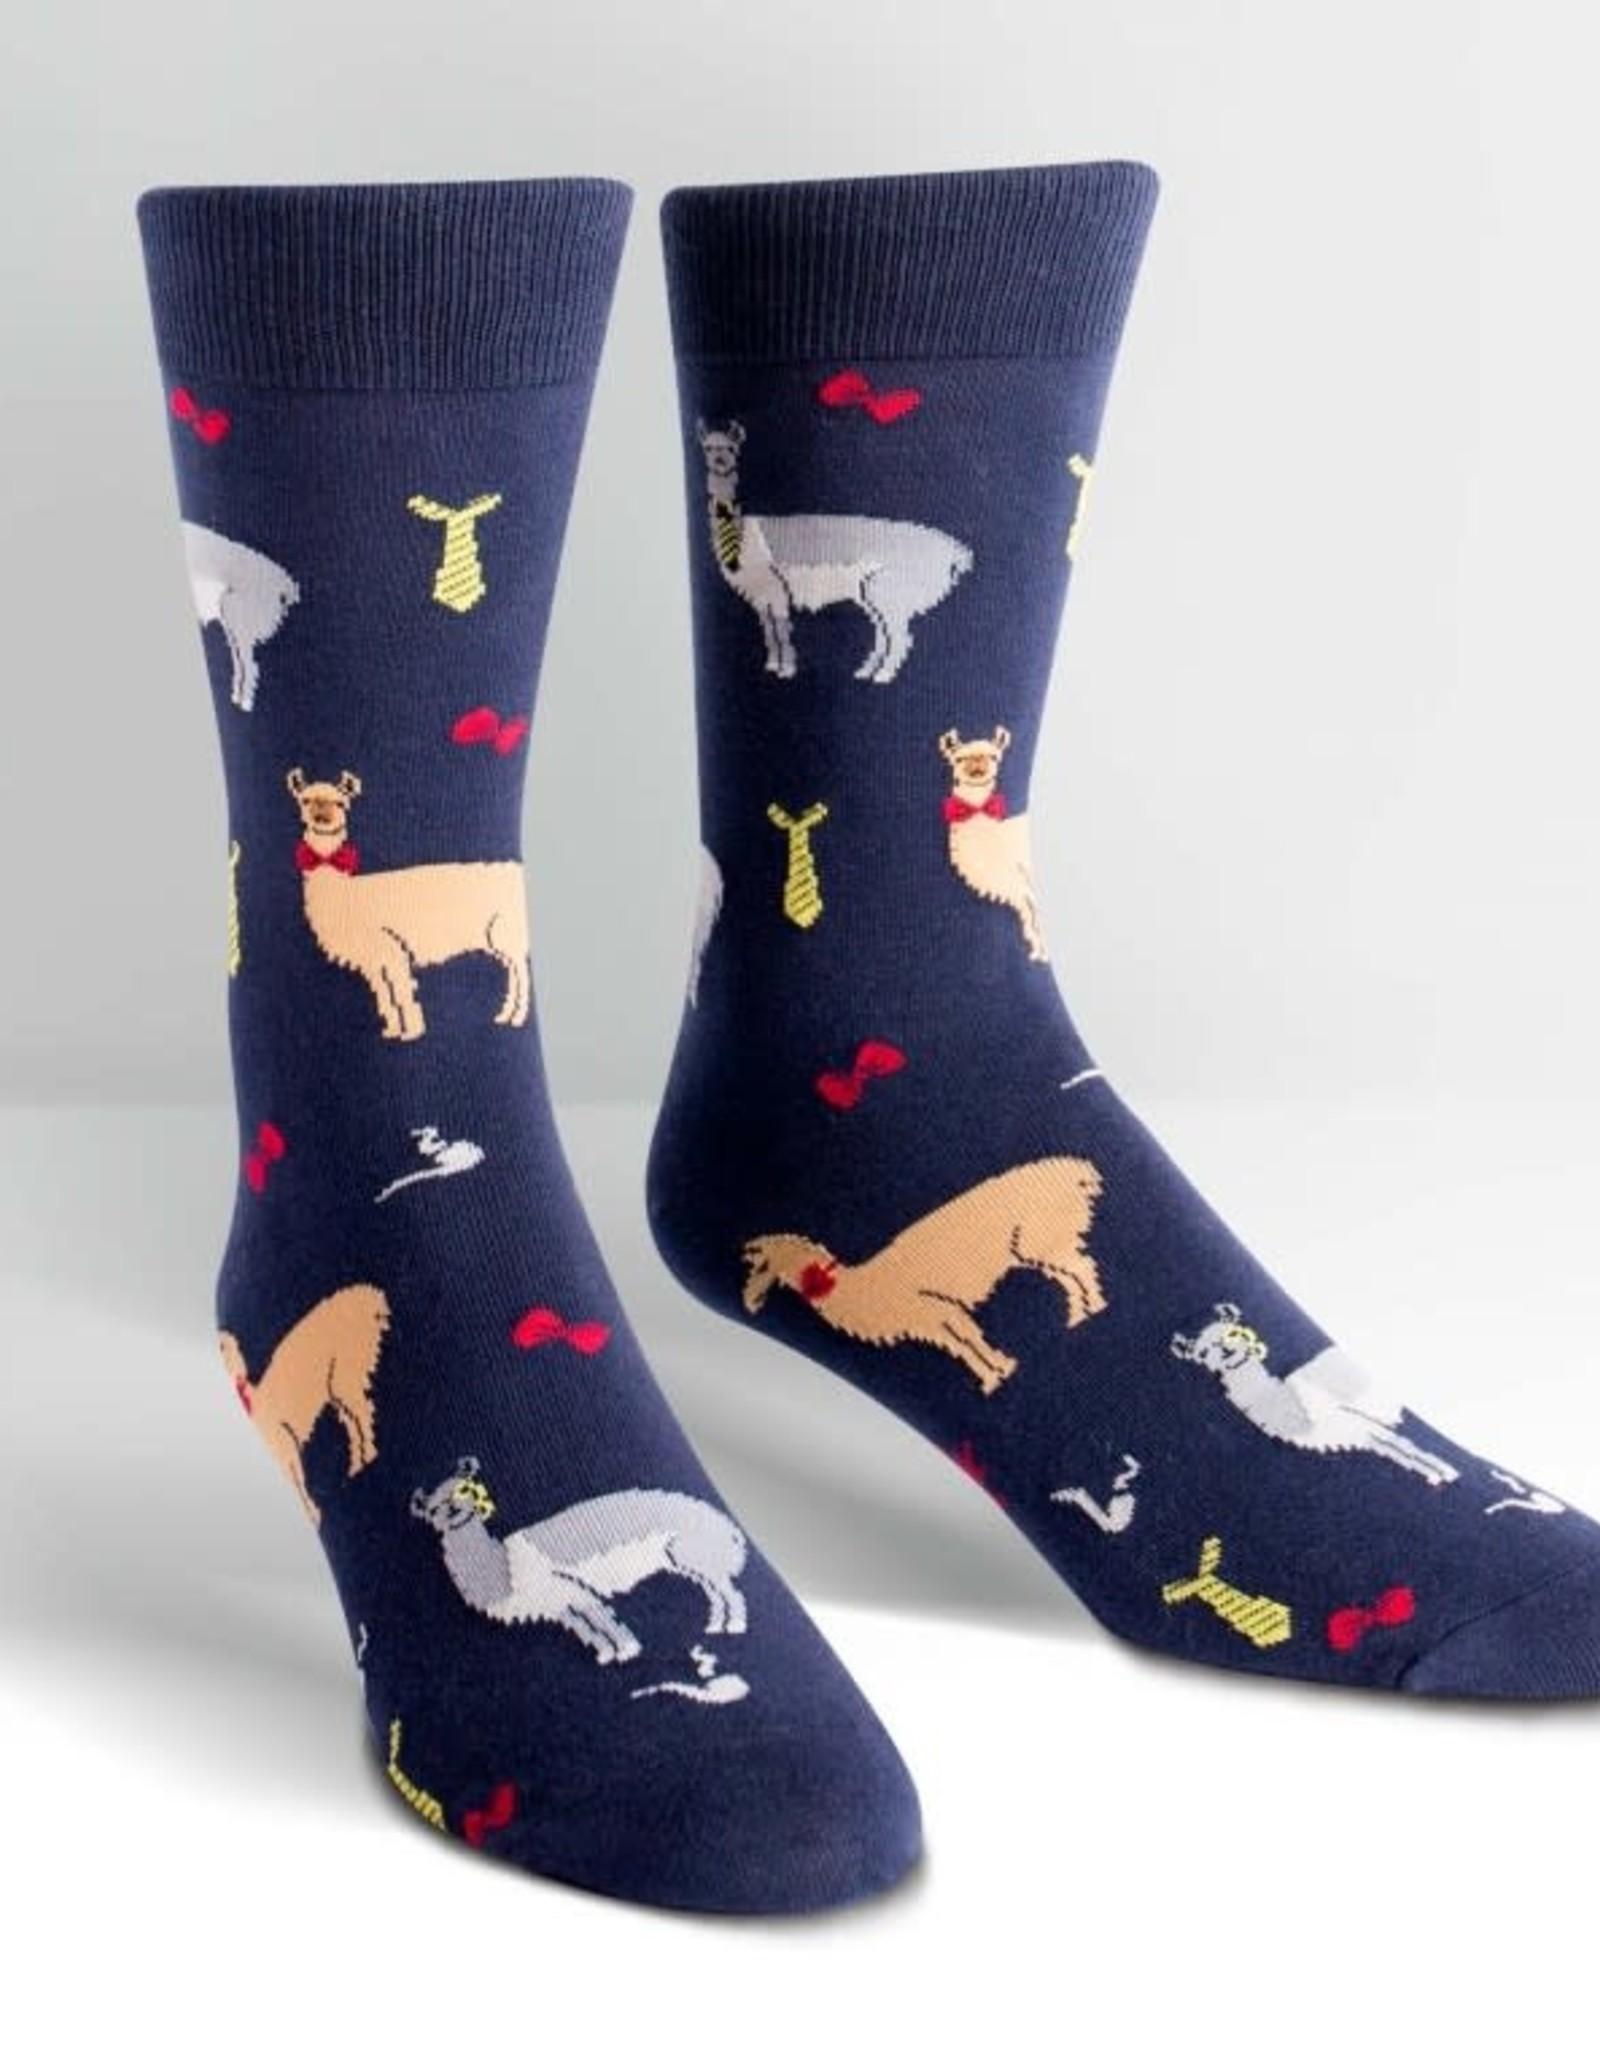 Sock It To Me MEN'S CREW: LLAMA DRAMA